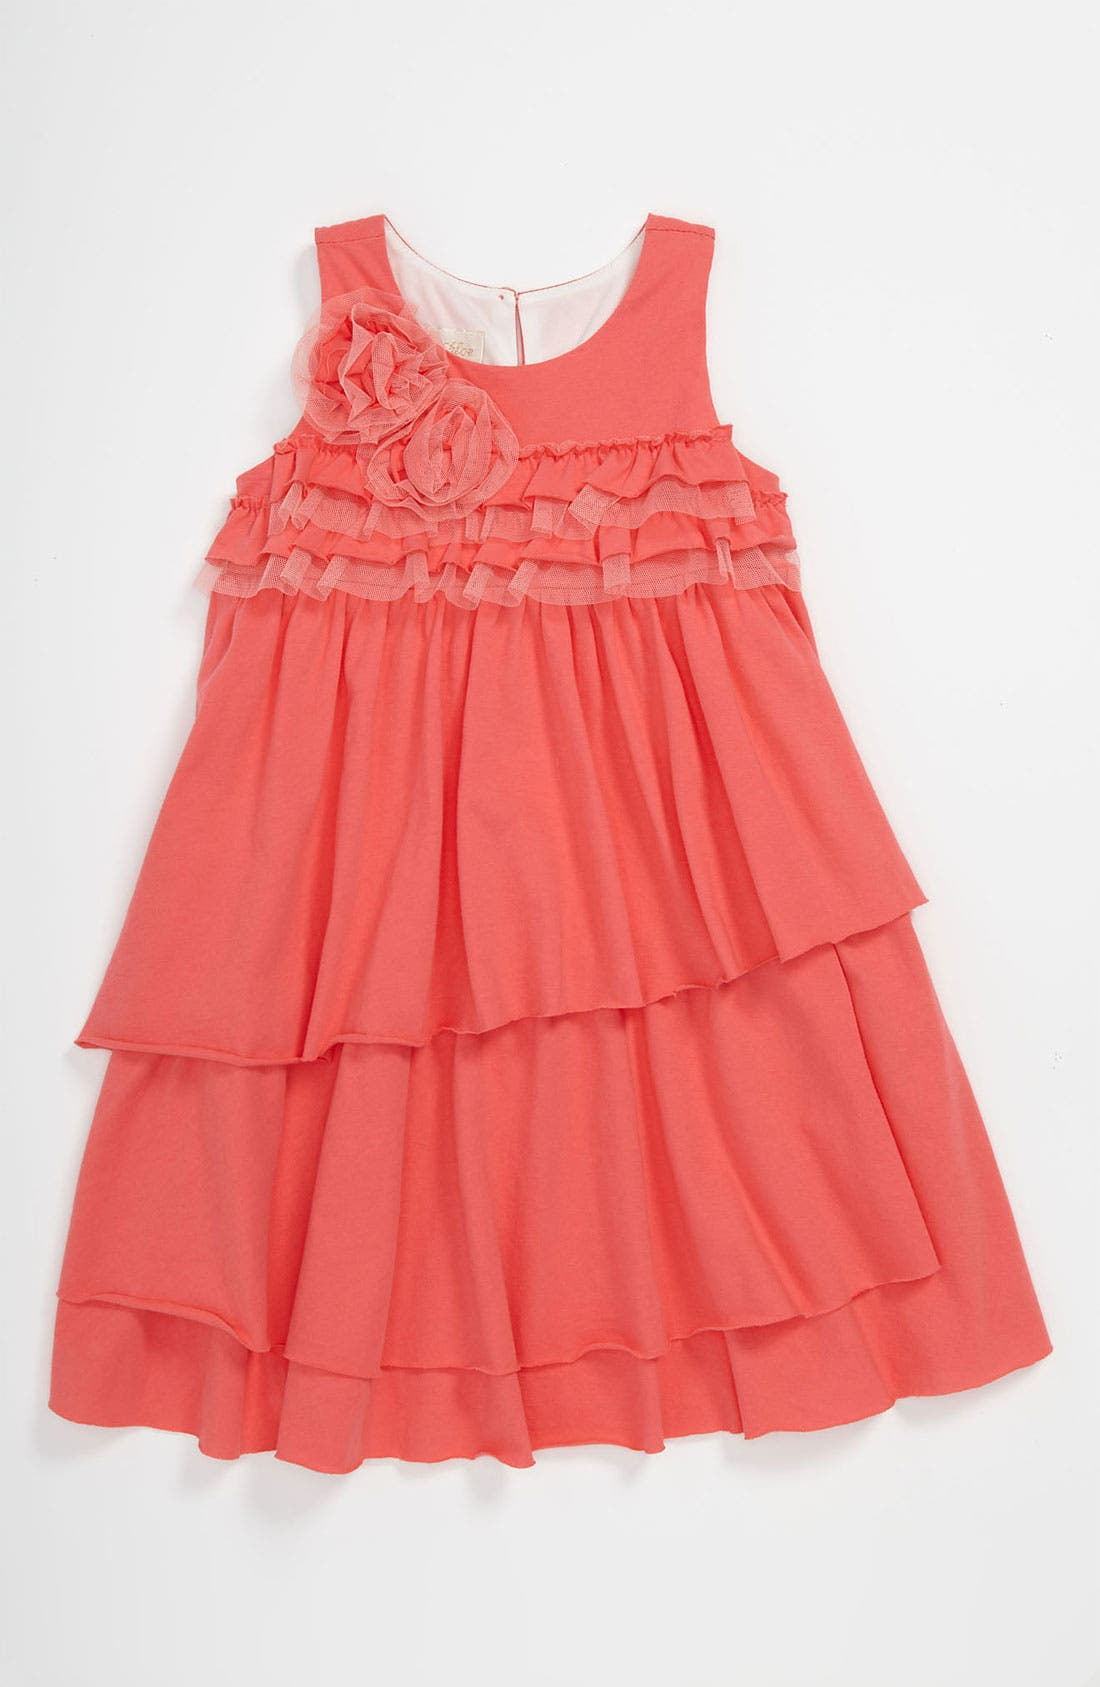 Main Image - Isobella & Chloe 'Jenny' Dress (Toddler)